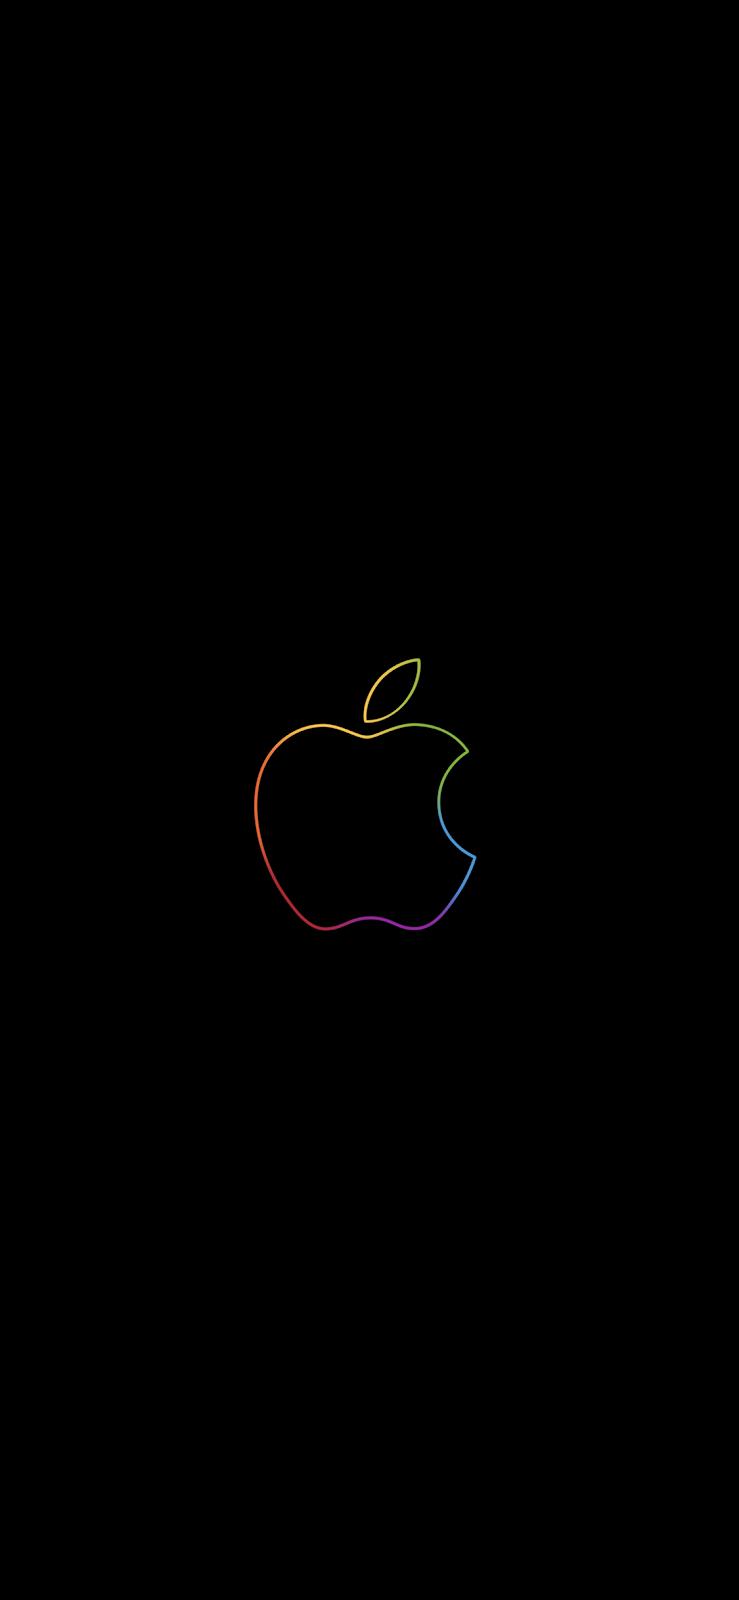 We Ll Be Right Back Apple Logo Wallpaper Iphone All Version Di 2020 Apple Logo Lukisan Galaksi Objek Gambar